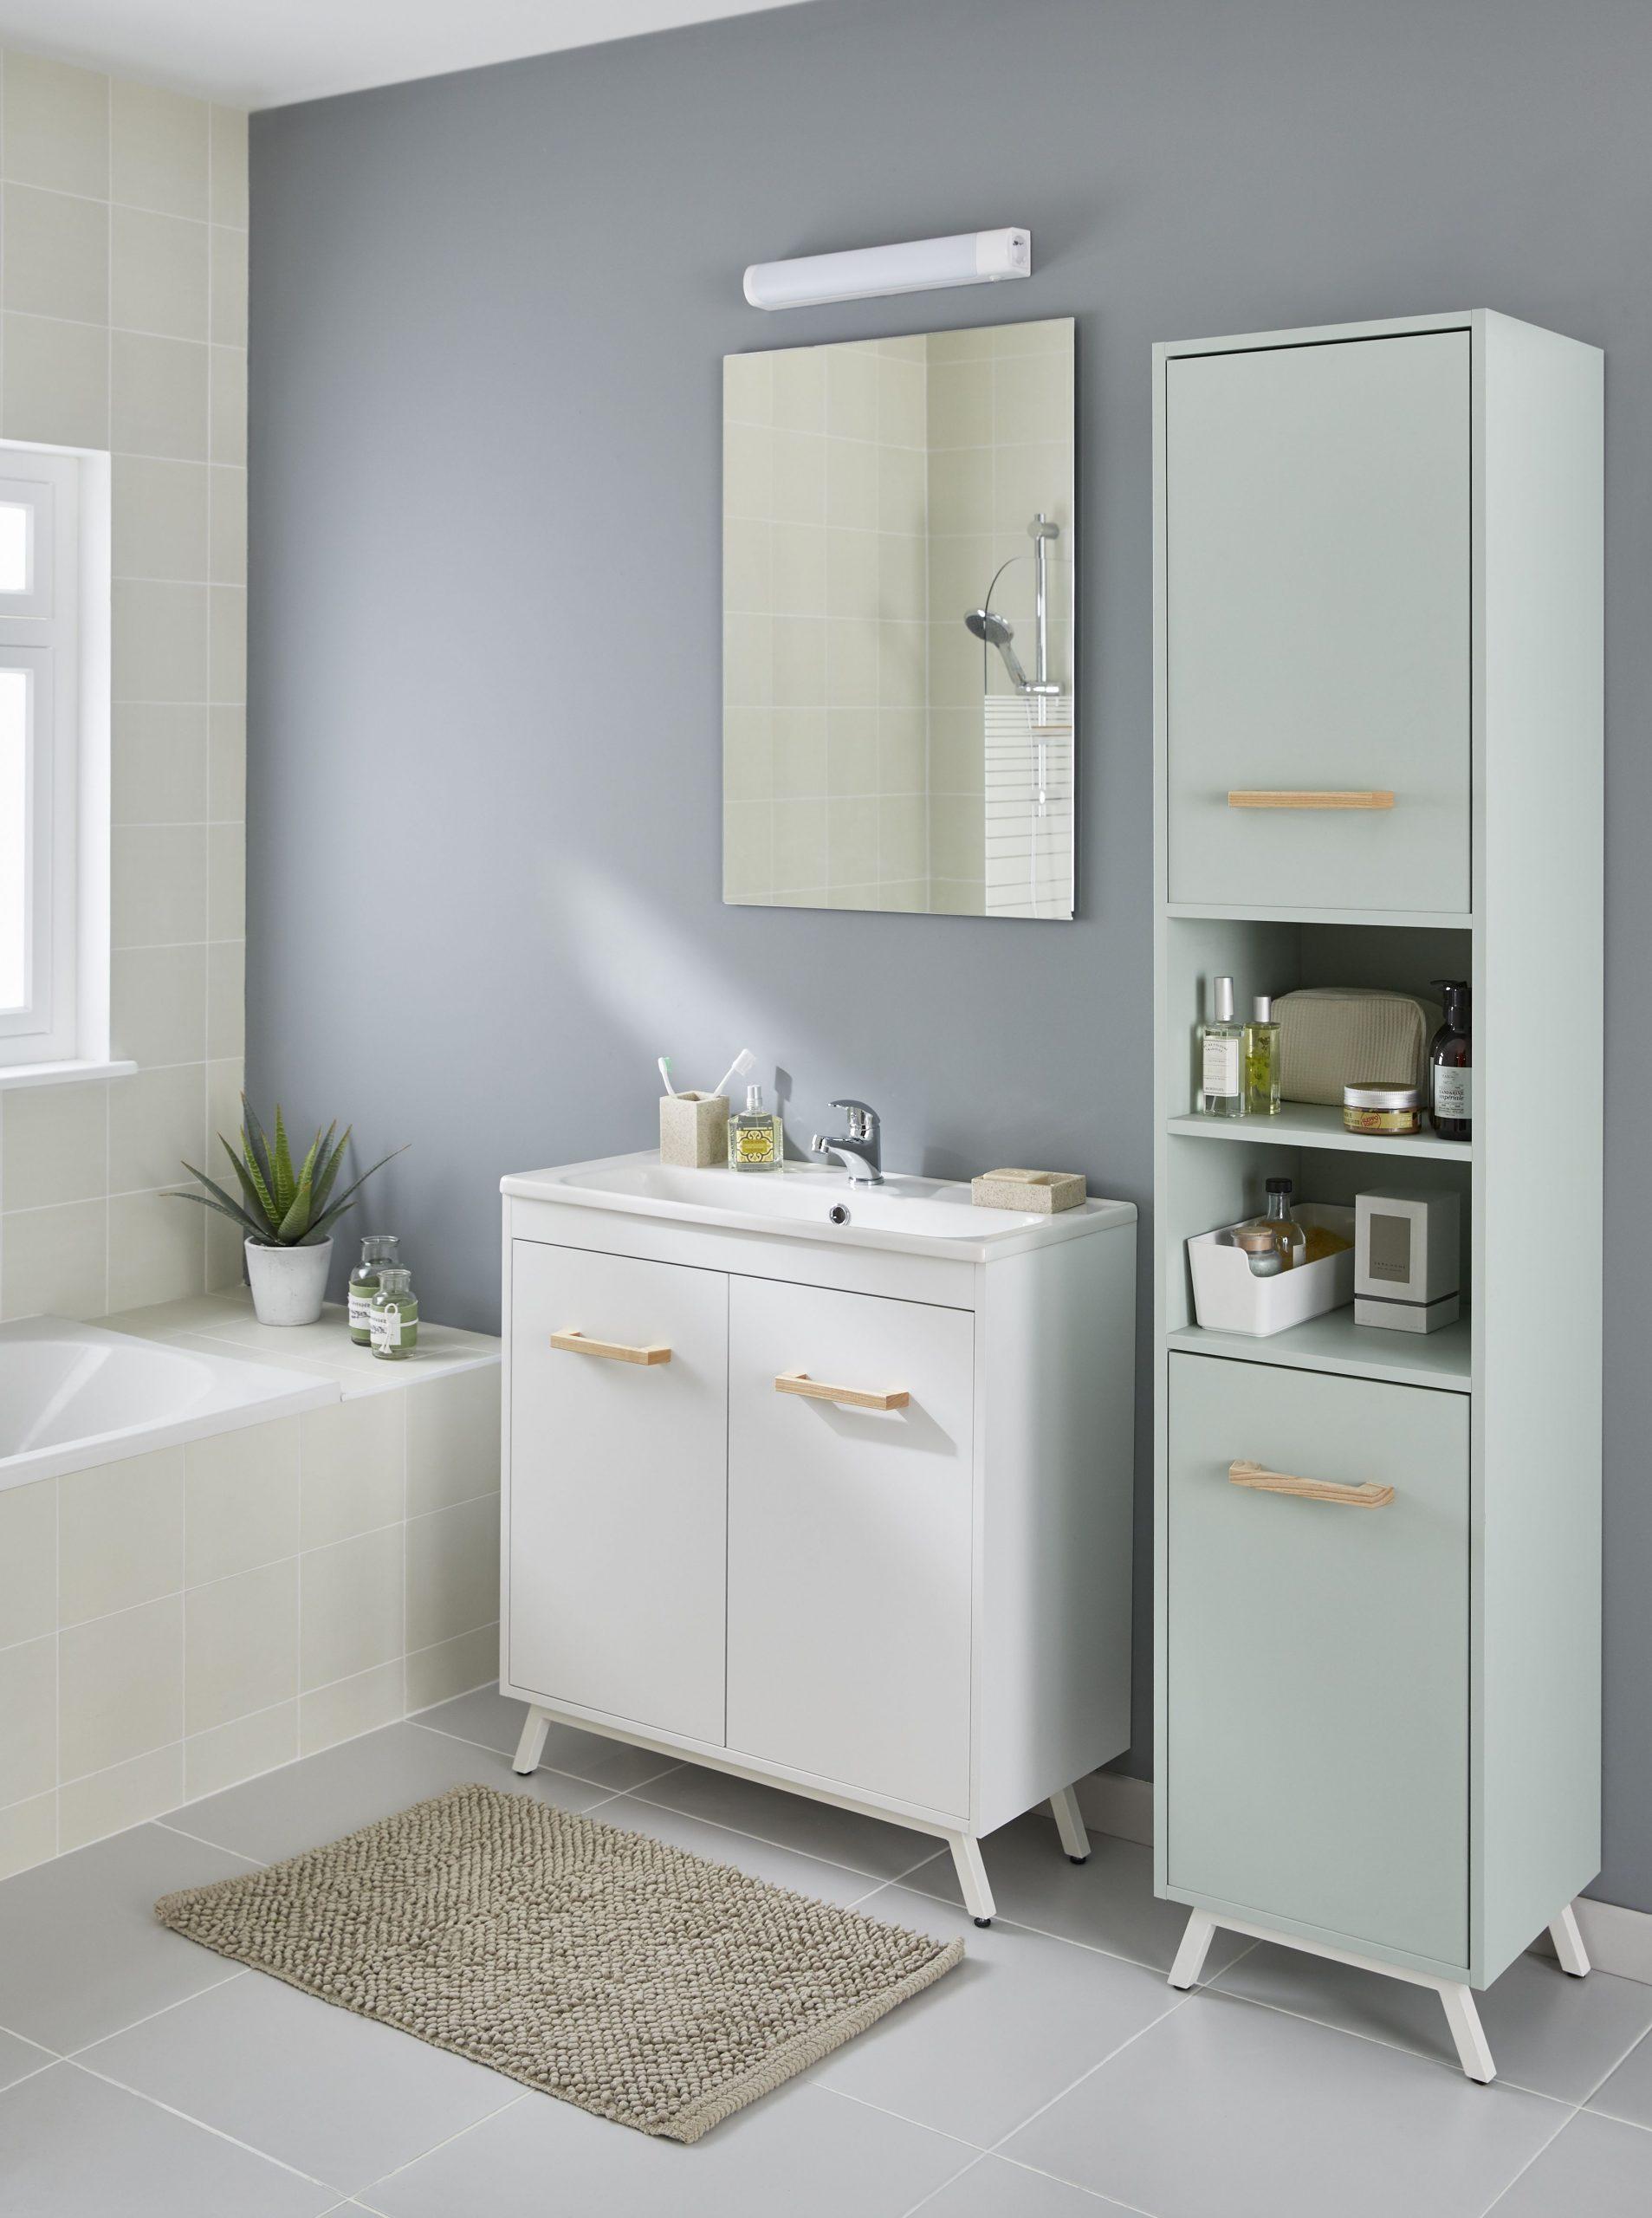 Simple And Beautiful | Bathroom Furniture, Master Bathroom ... intérieur Smart Tiles Castorama